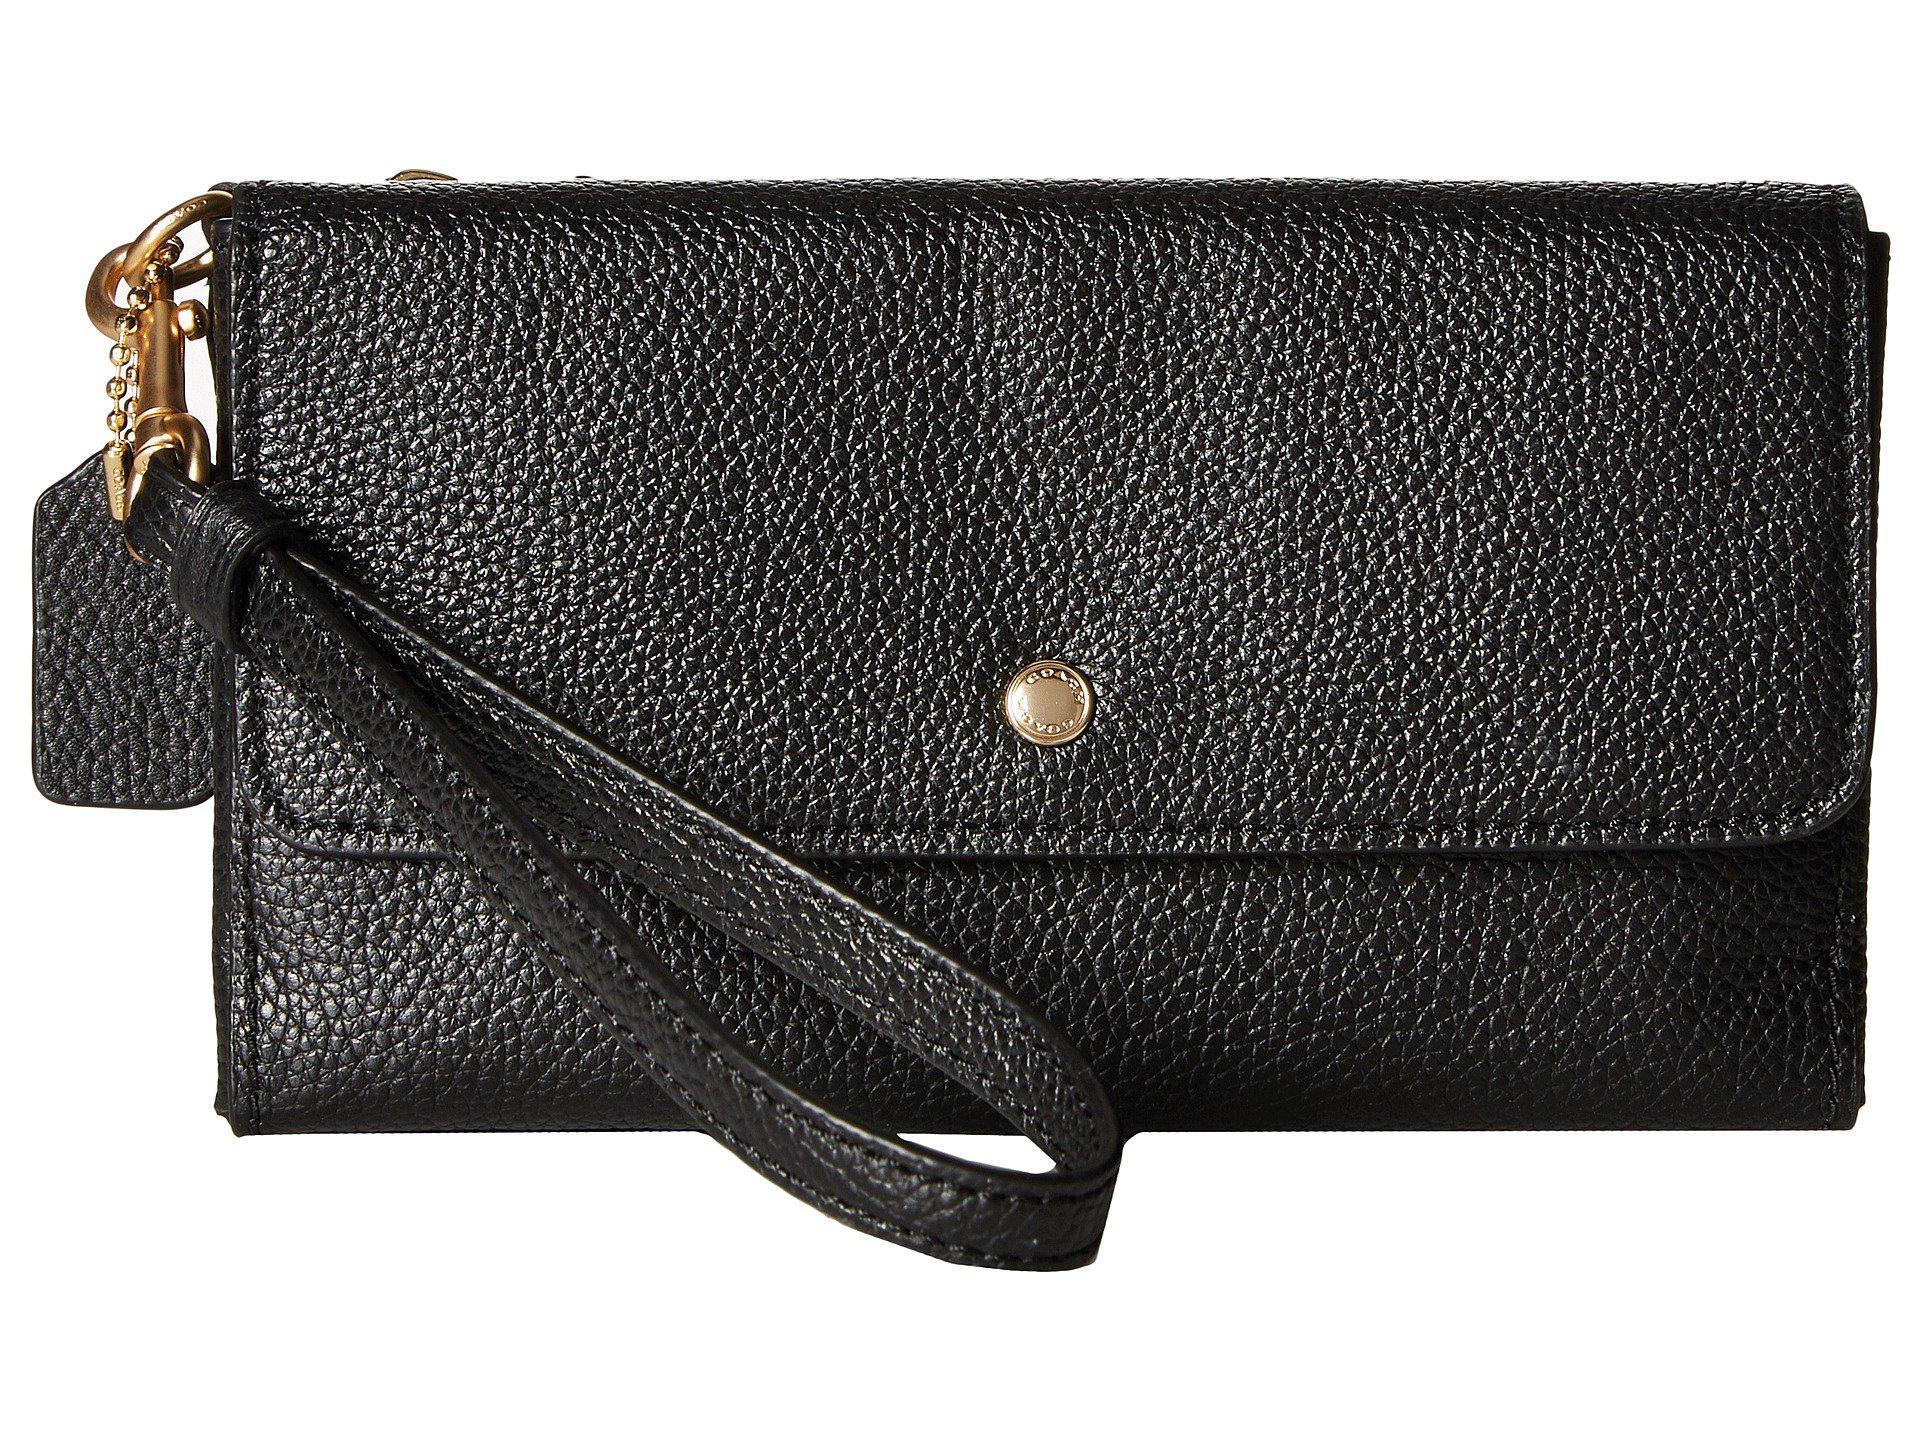 72589c2f7174 Lyst - COACH Triple Small Wristlet In Polished Pebble Leather (li ...